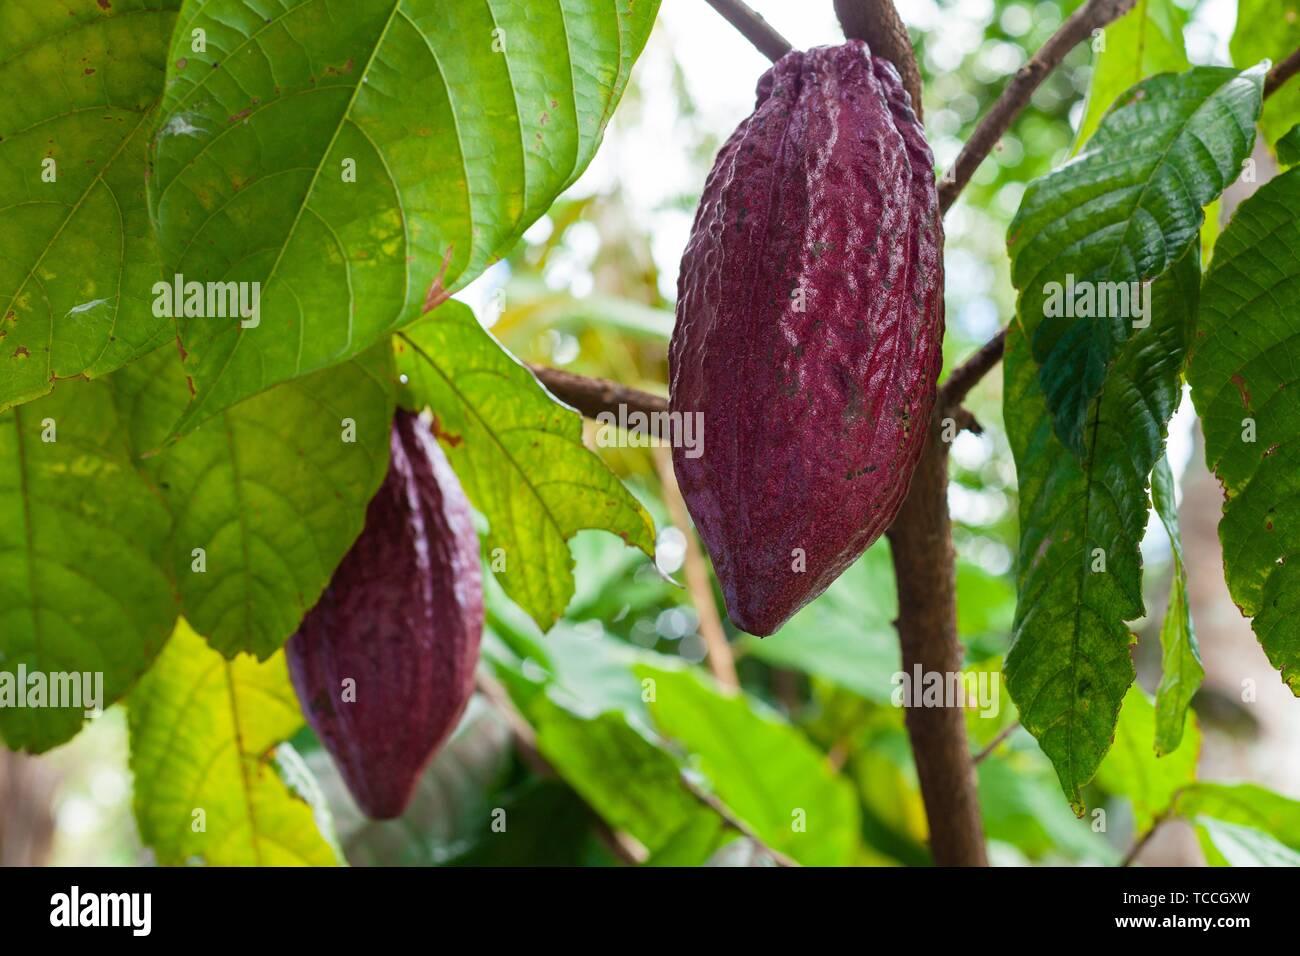 Trinitario de cacao (Theobroma cacao) vainas en Sumatra, Indonesia. Foto de stock